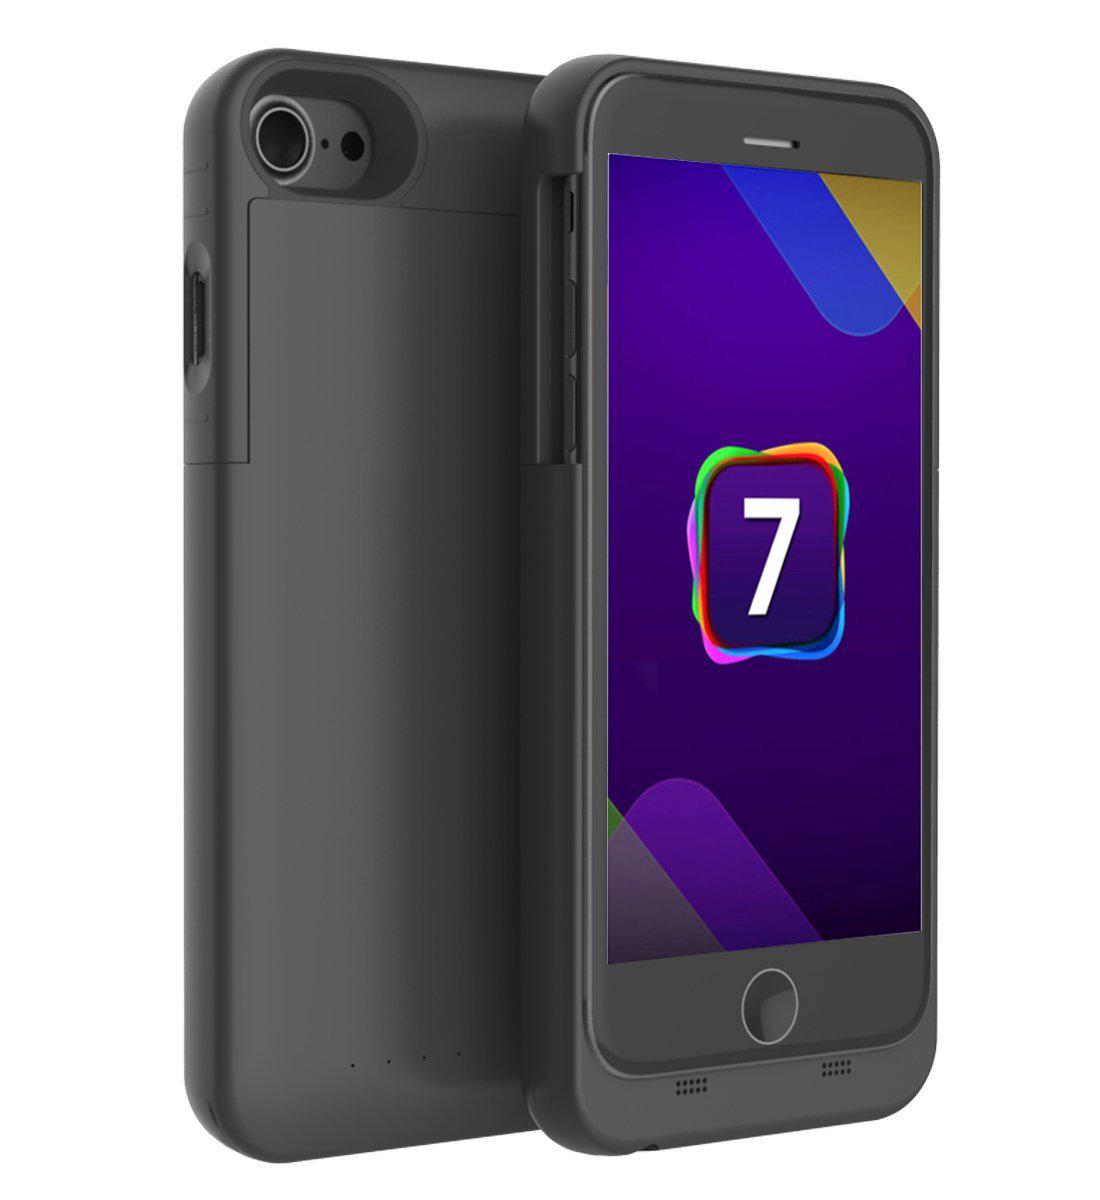 iPhone 7/7 Plus用のおしゃれ/人気なケース・カバー - バッテリー内蔵ケース・カバー